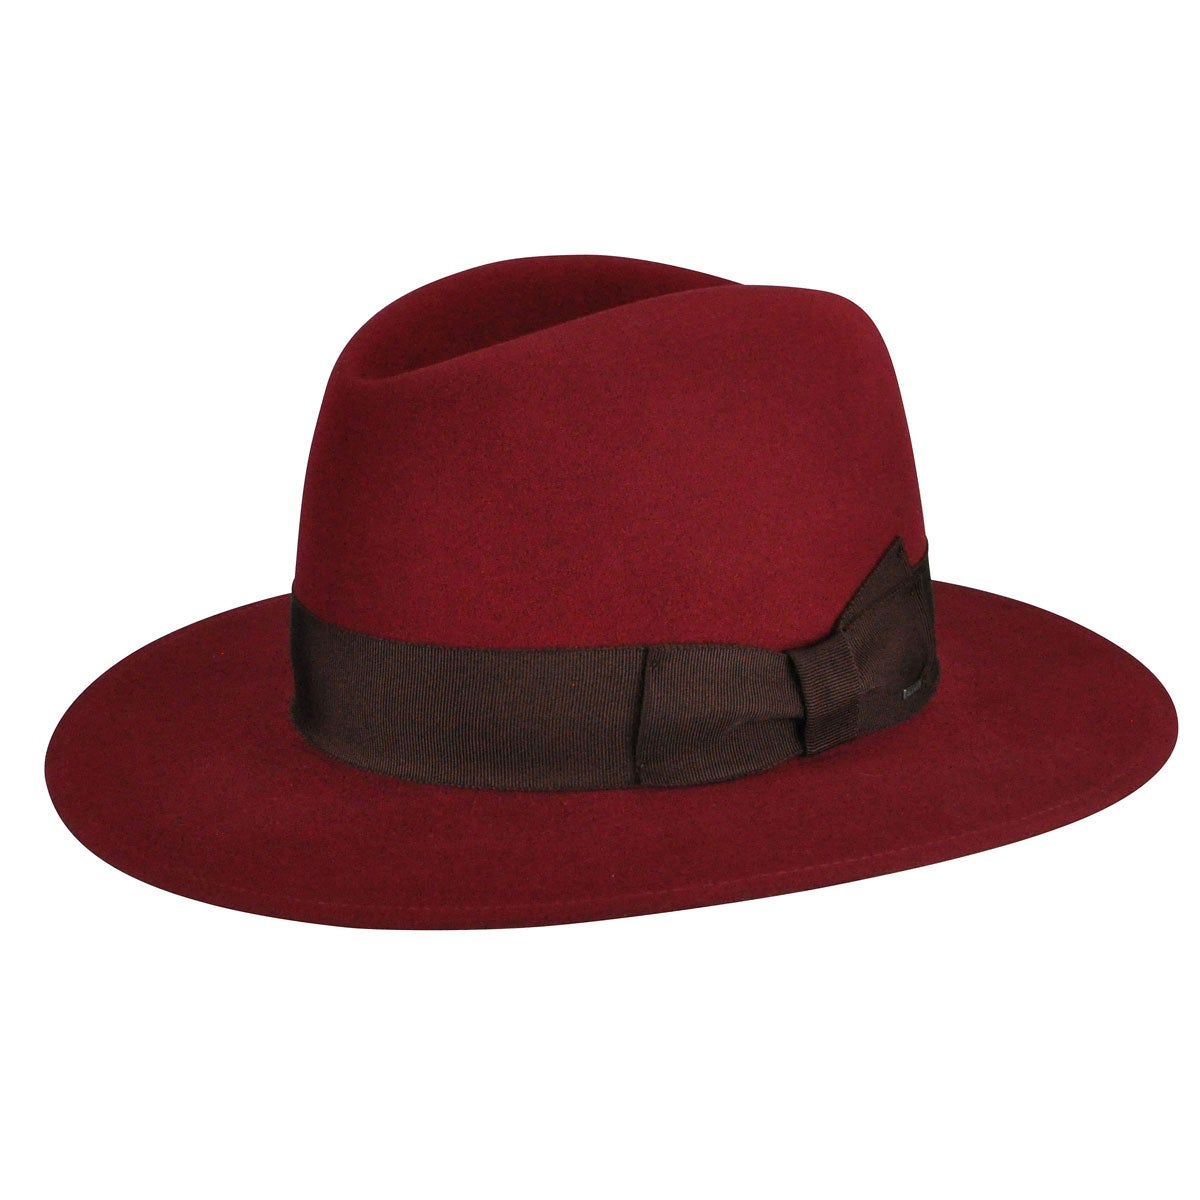 1920s Mens Hats – 8 Popular Styles Hiram Tall Crown Fedora $125.00 AT vintagedancer.com